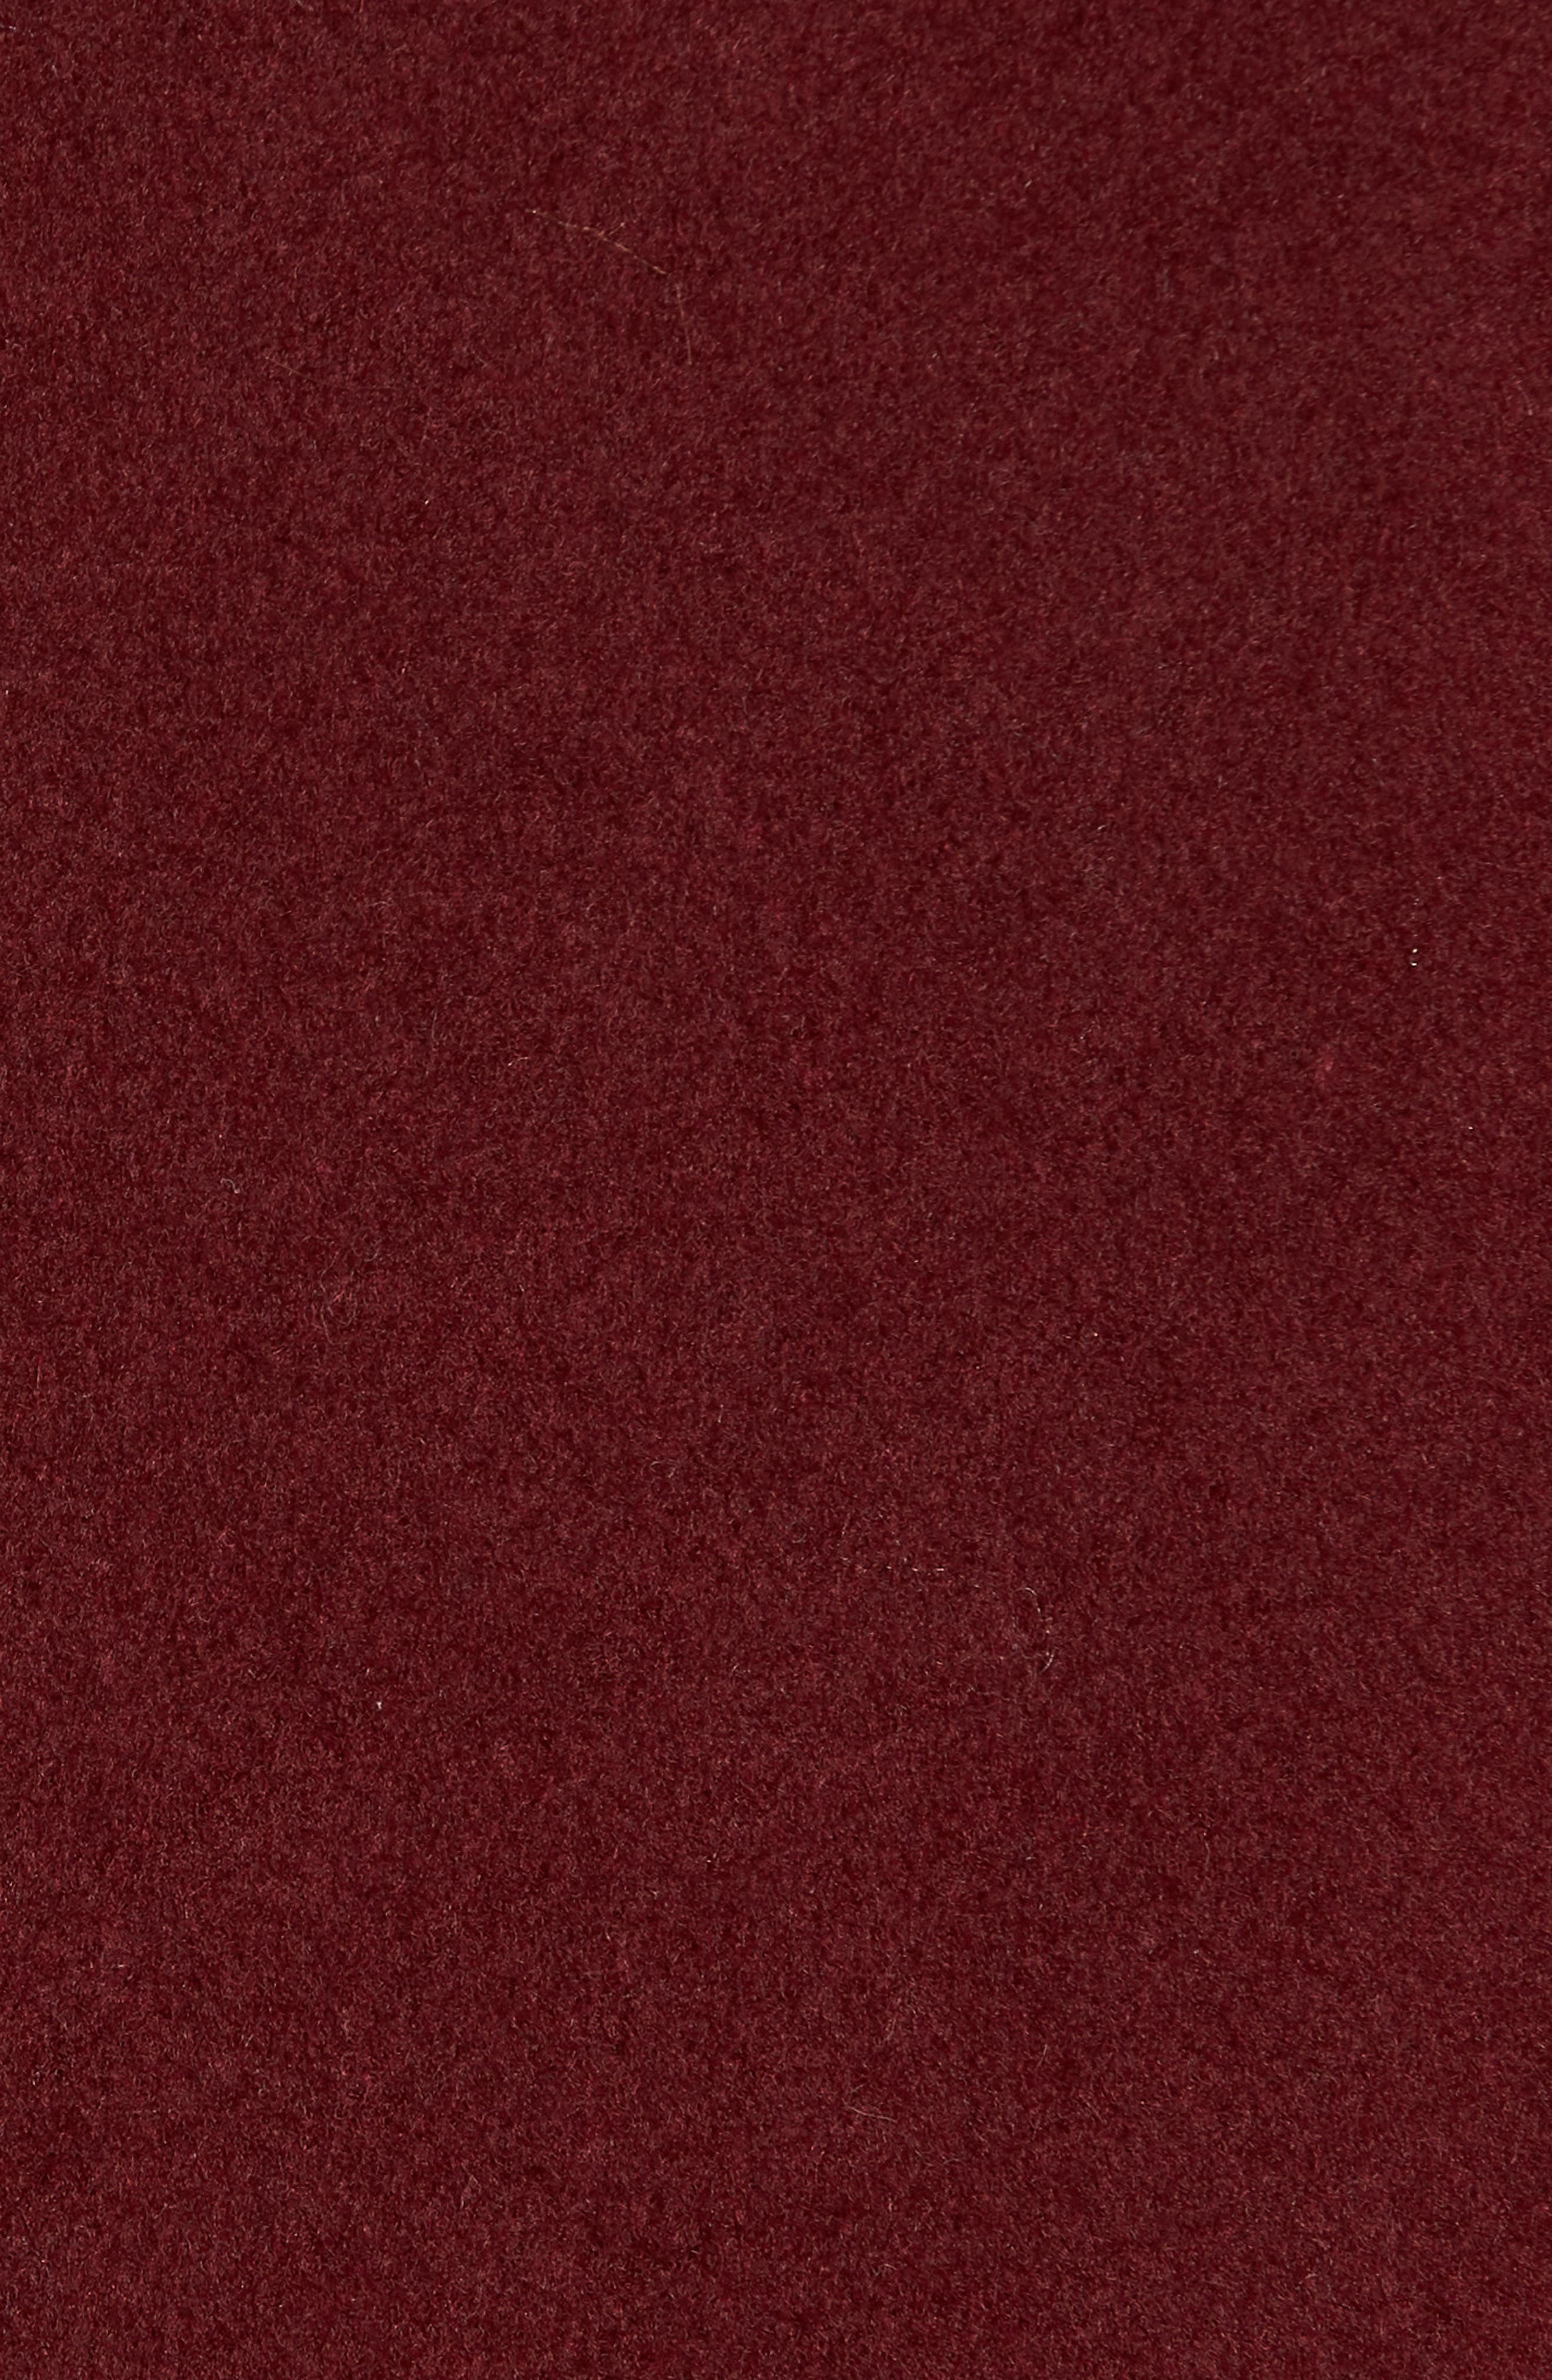 Wool Blend Menswear Coat,                             Alternate thumbnail 7, color,                             BURGUNDY